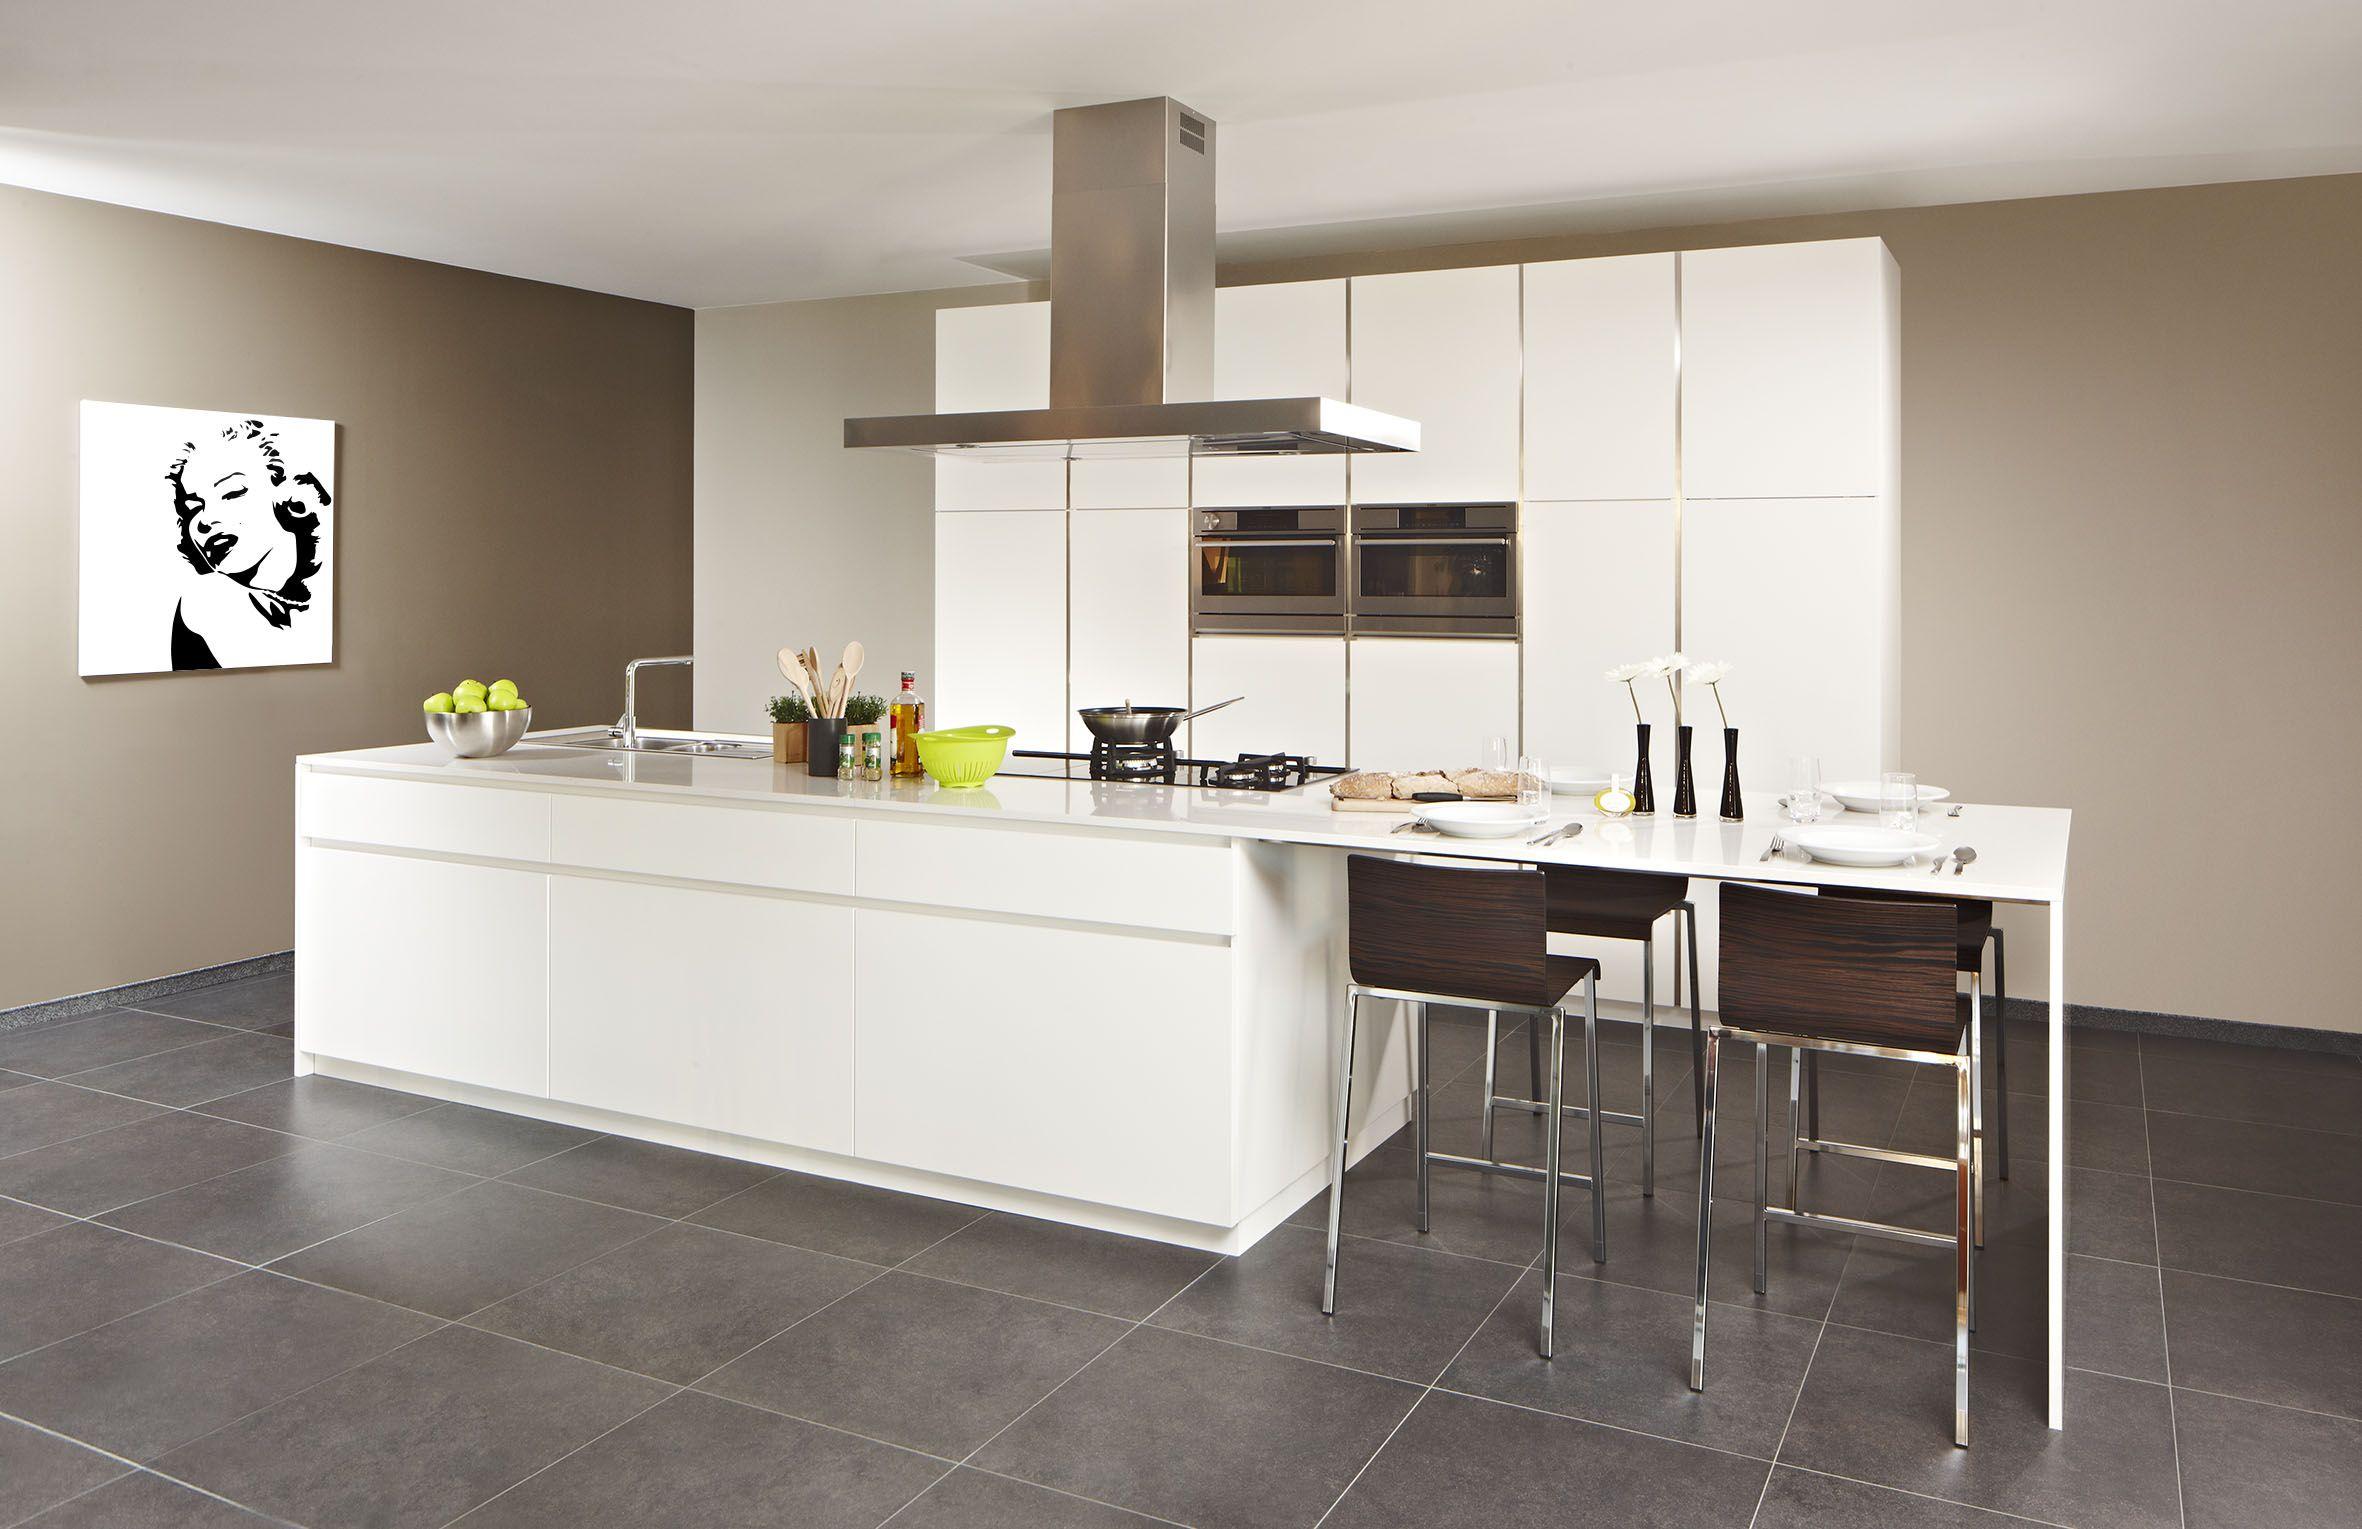 Moderne opstelling van de keuken waarvan het werkblad naadloos